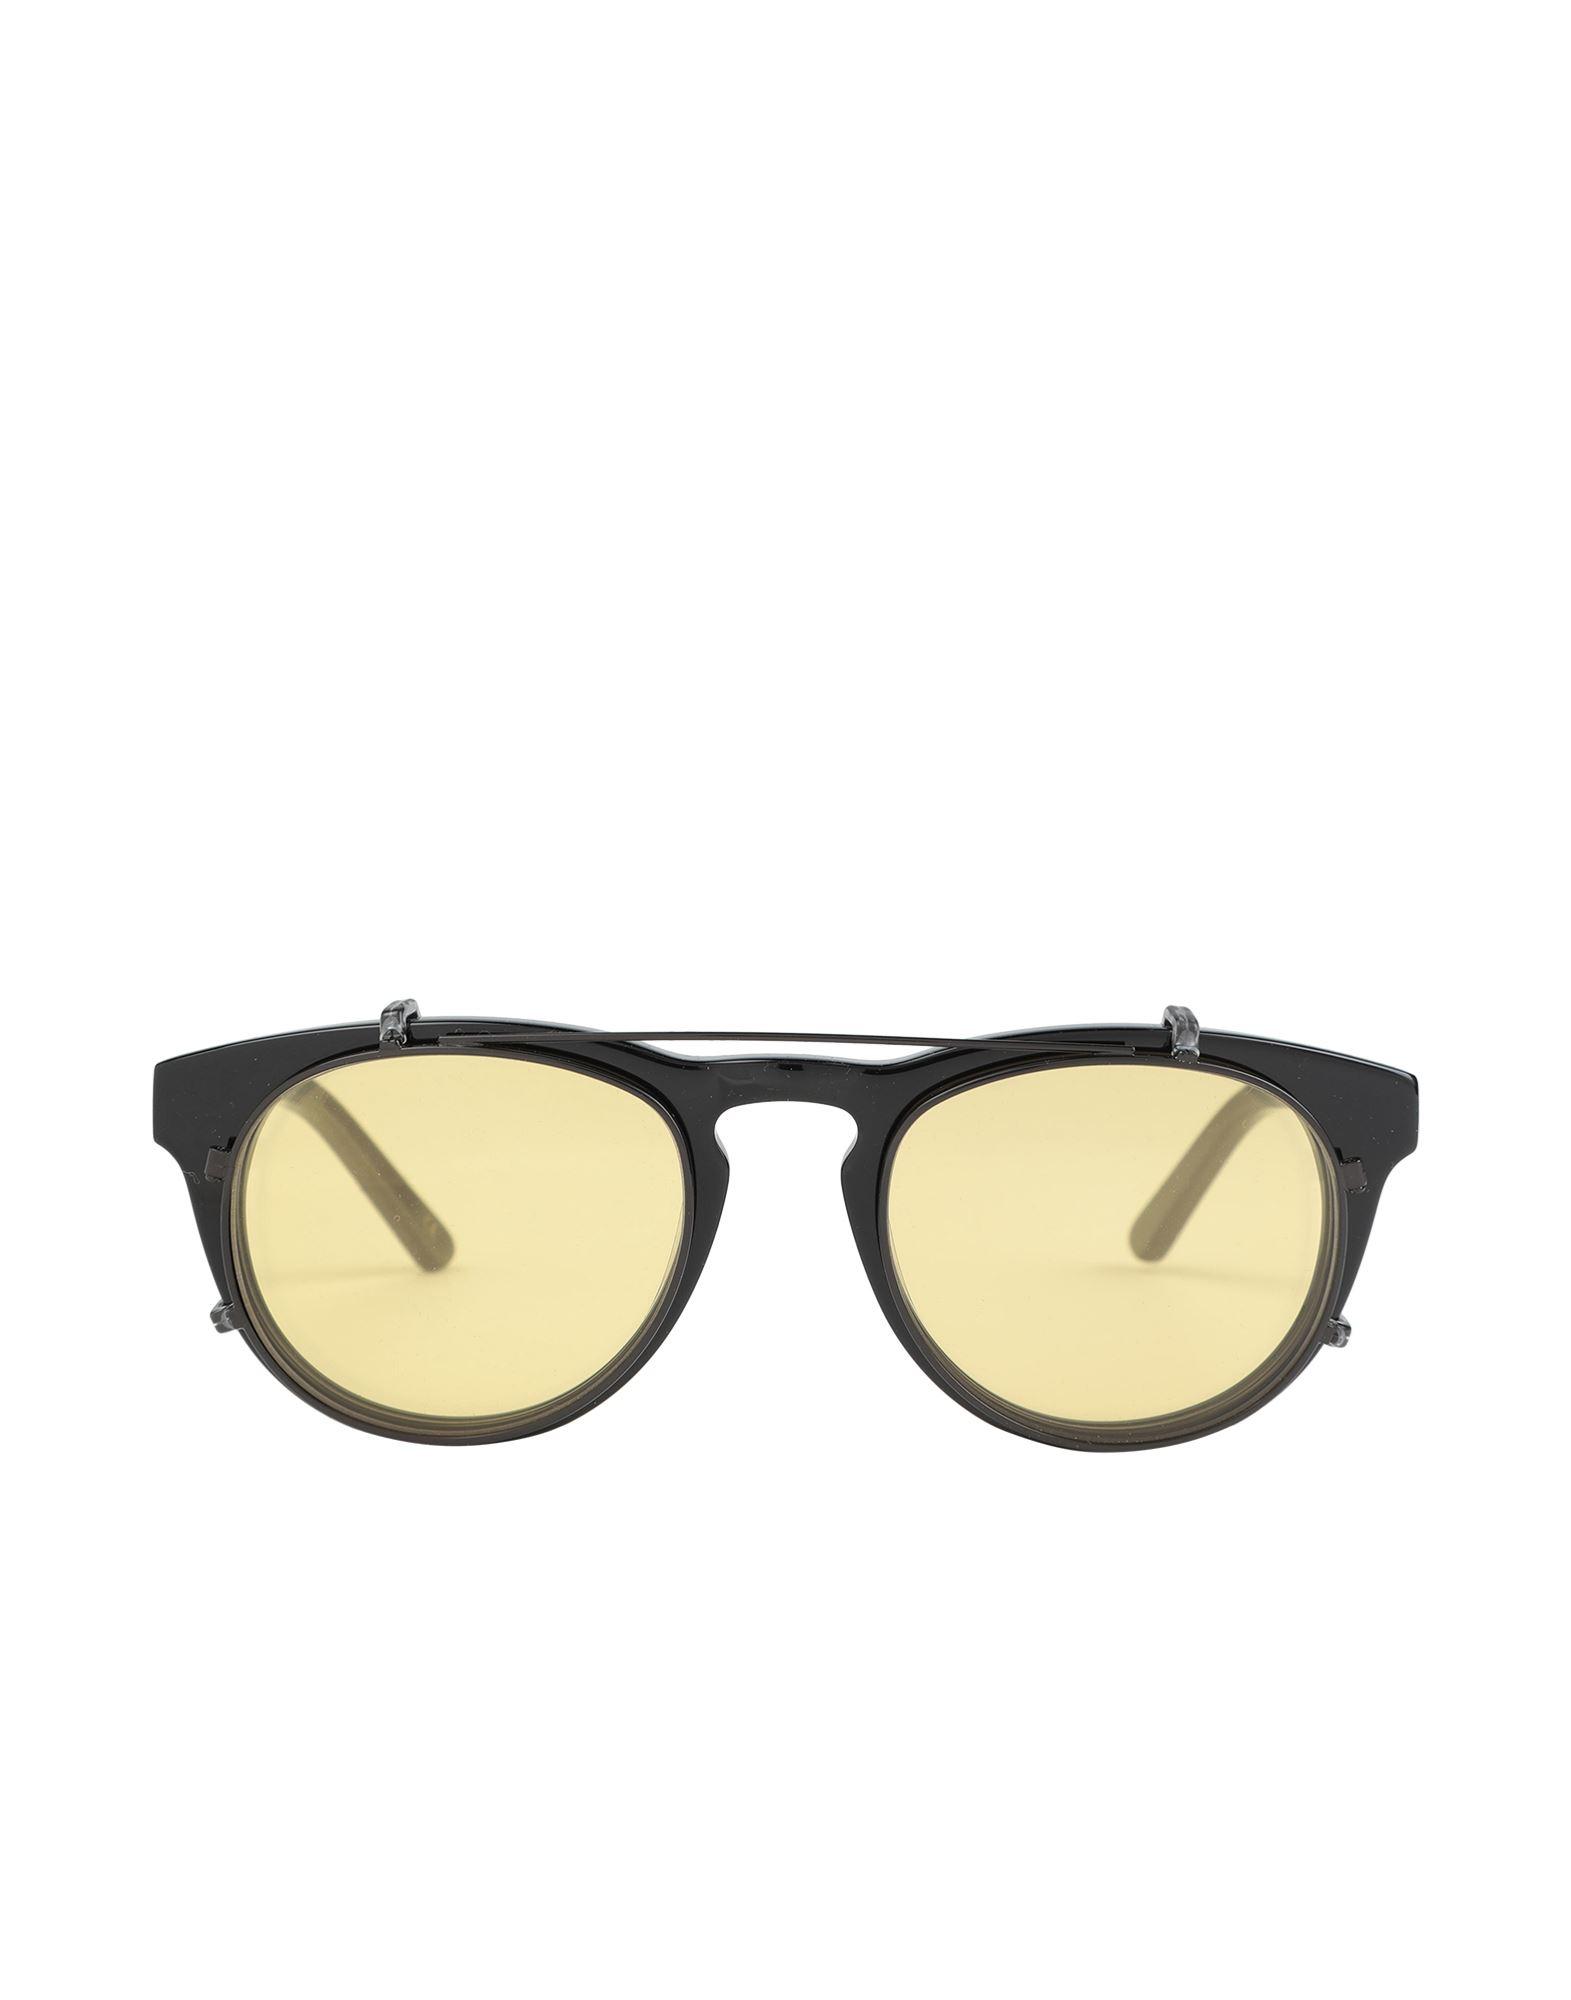 HAN KJØBENHAVN Sunglasses - Item 46737555